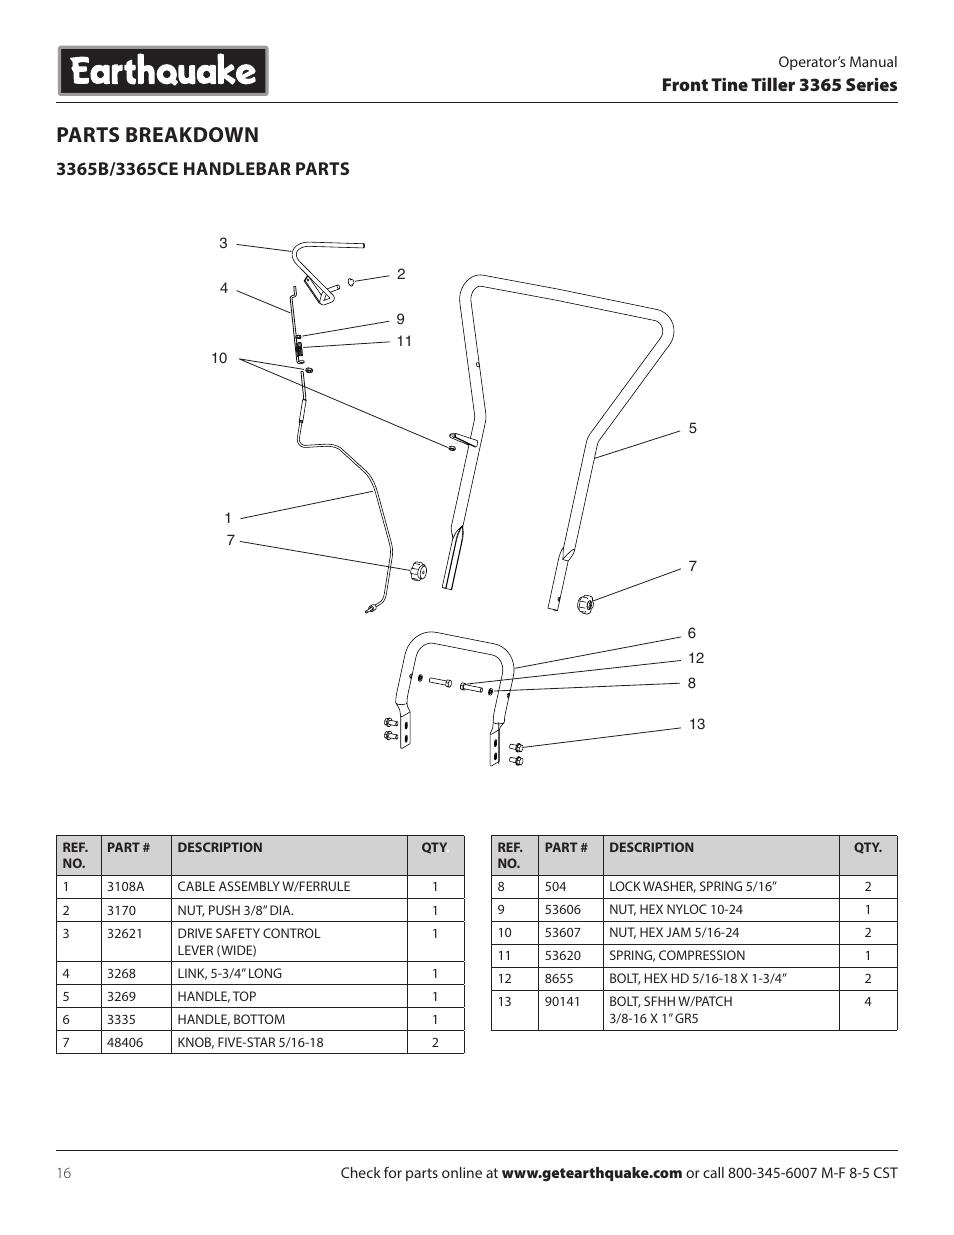 Parts breakdown, Front tine tiller 3365 series